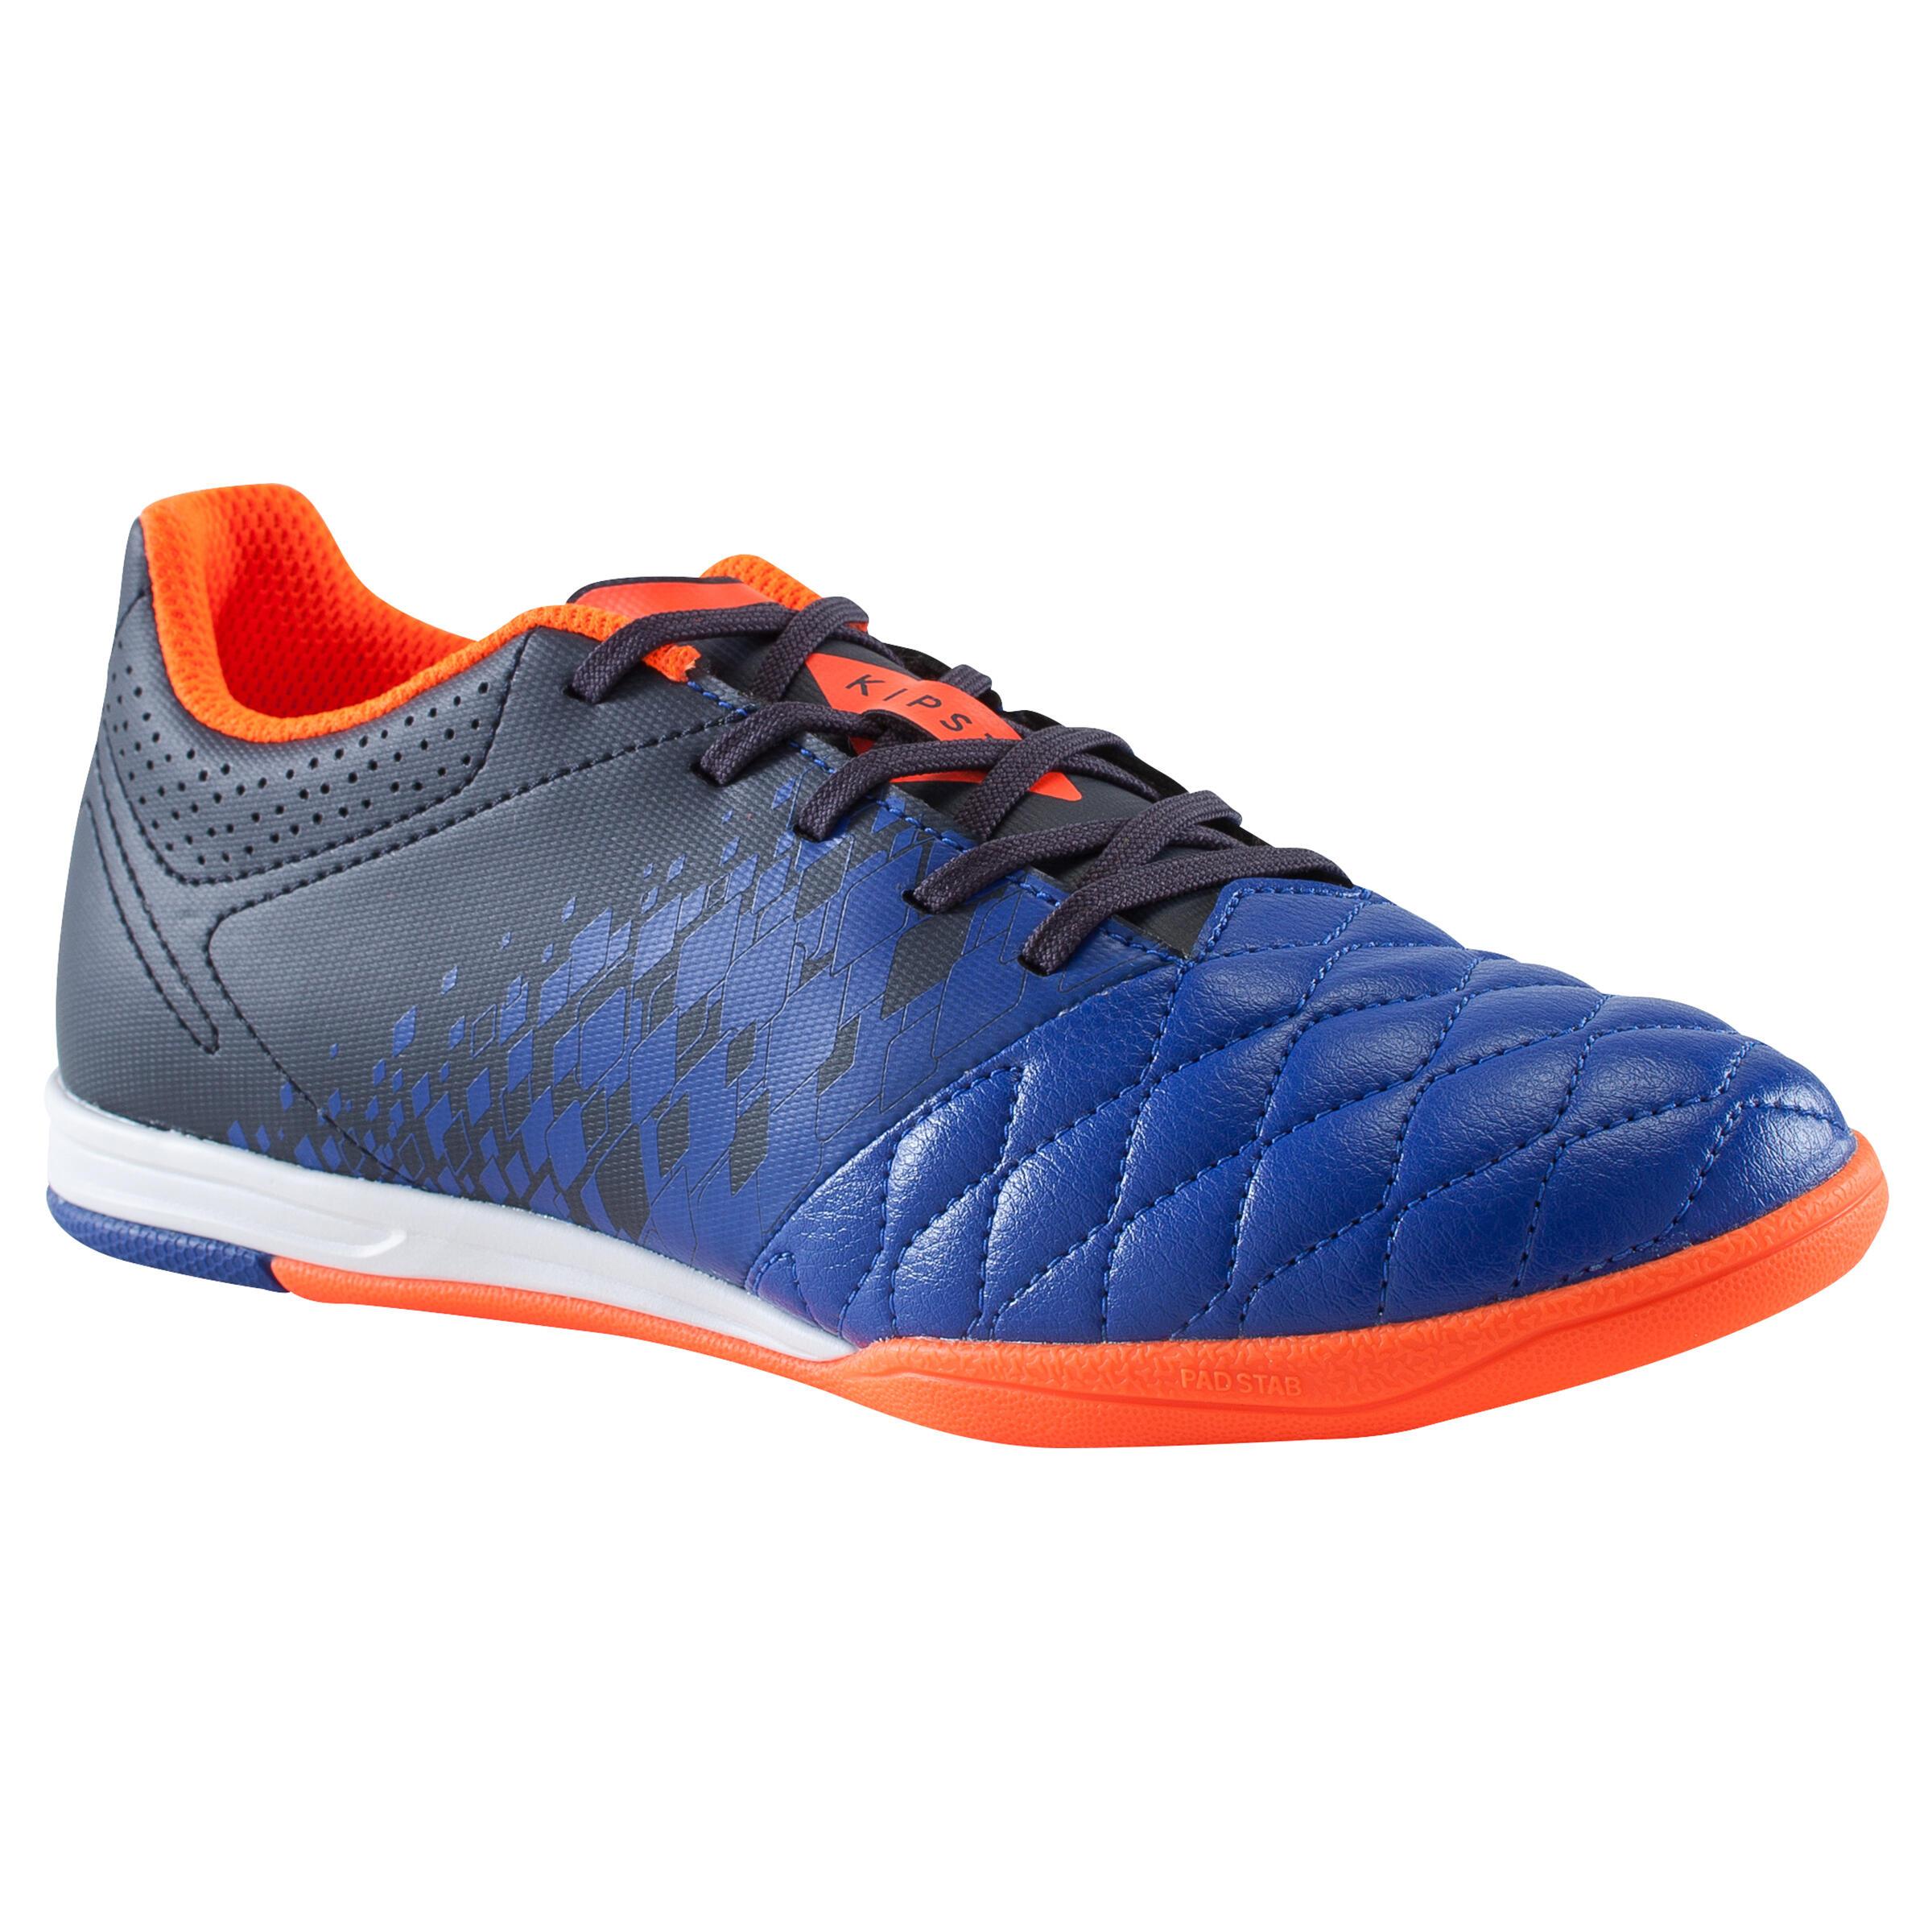 4e2e55c15498 ... 300 chaussure Clr Nike Decathlon Sala Adulte Chaussure Futsal p8wq8t ...